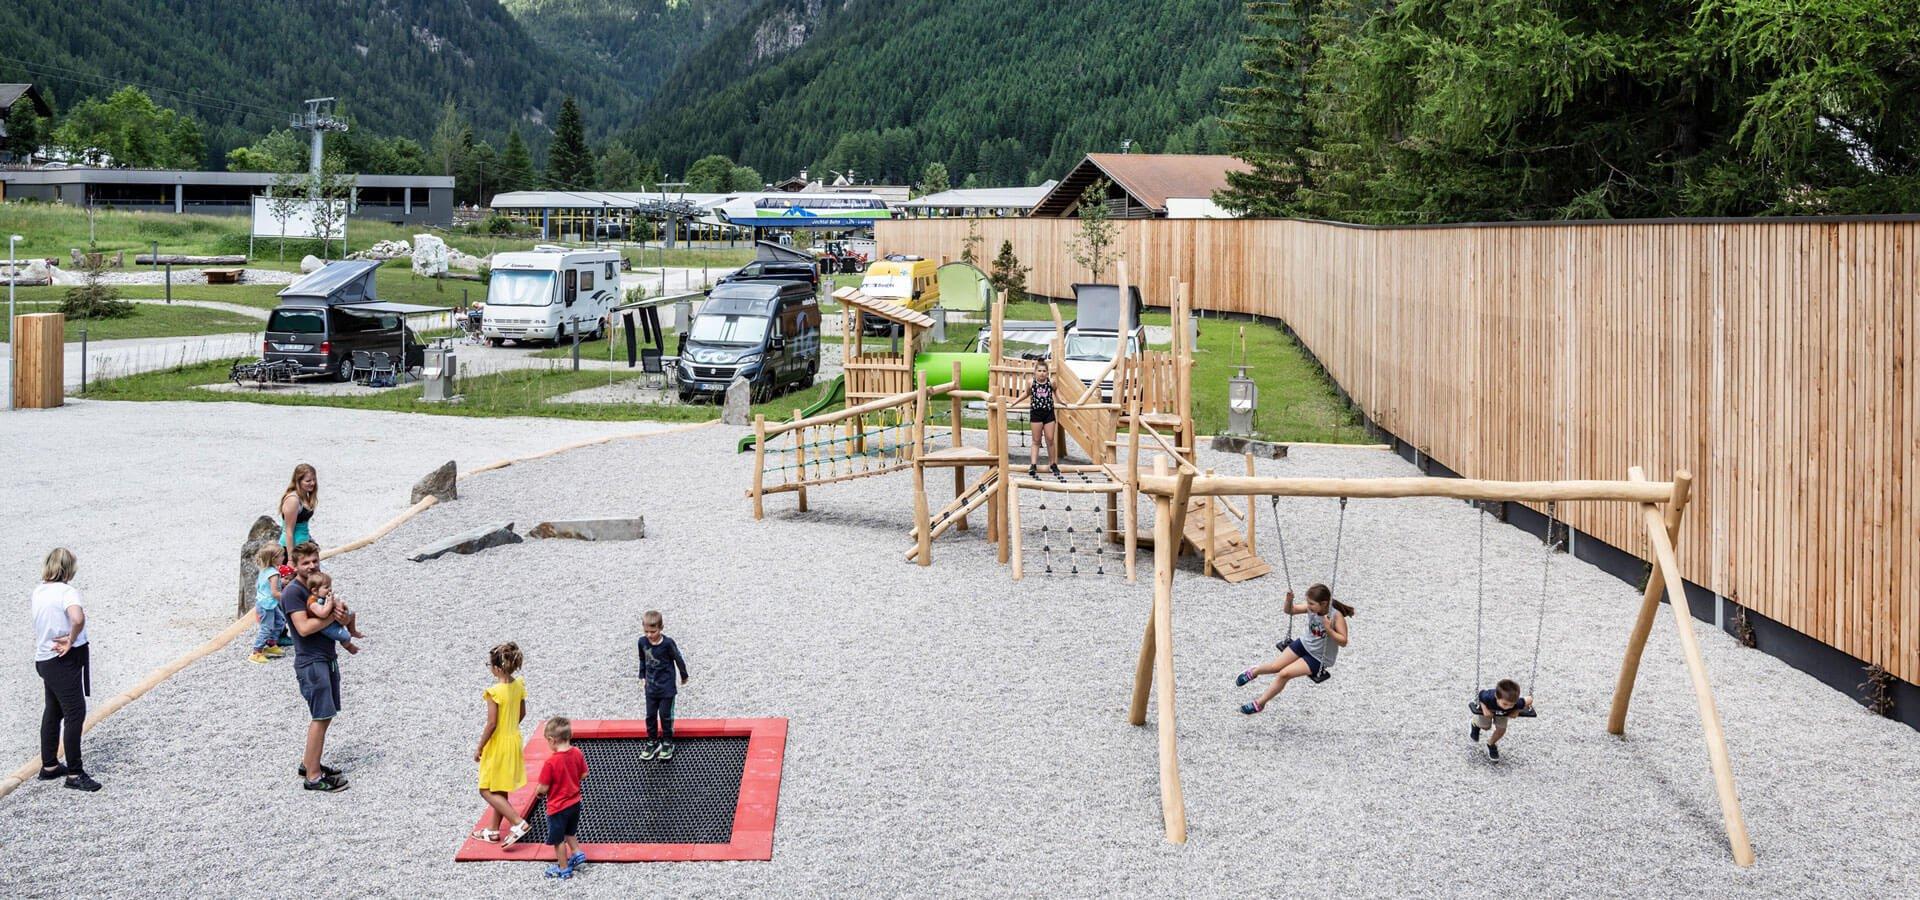 Camping mit Kindern in Südtirol